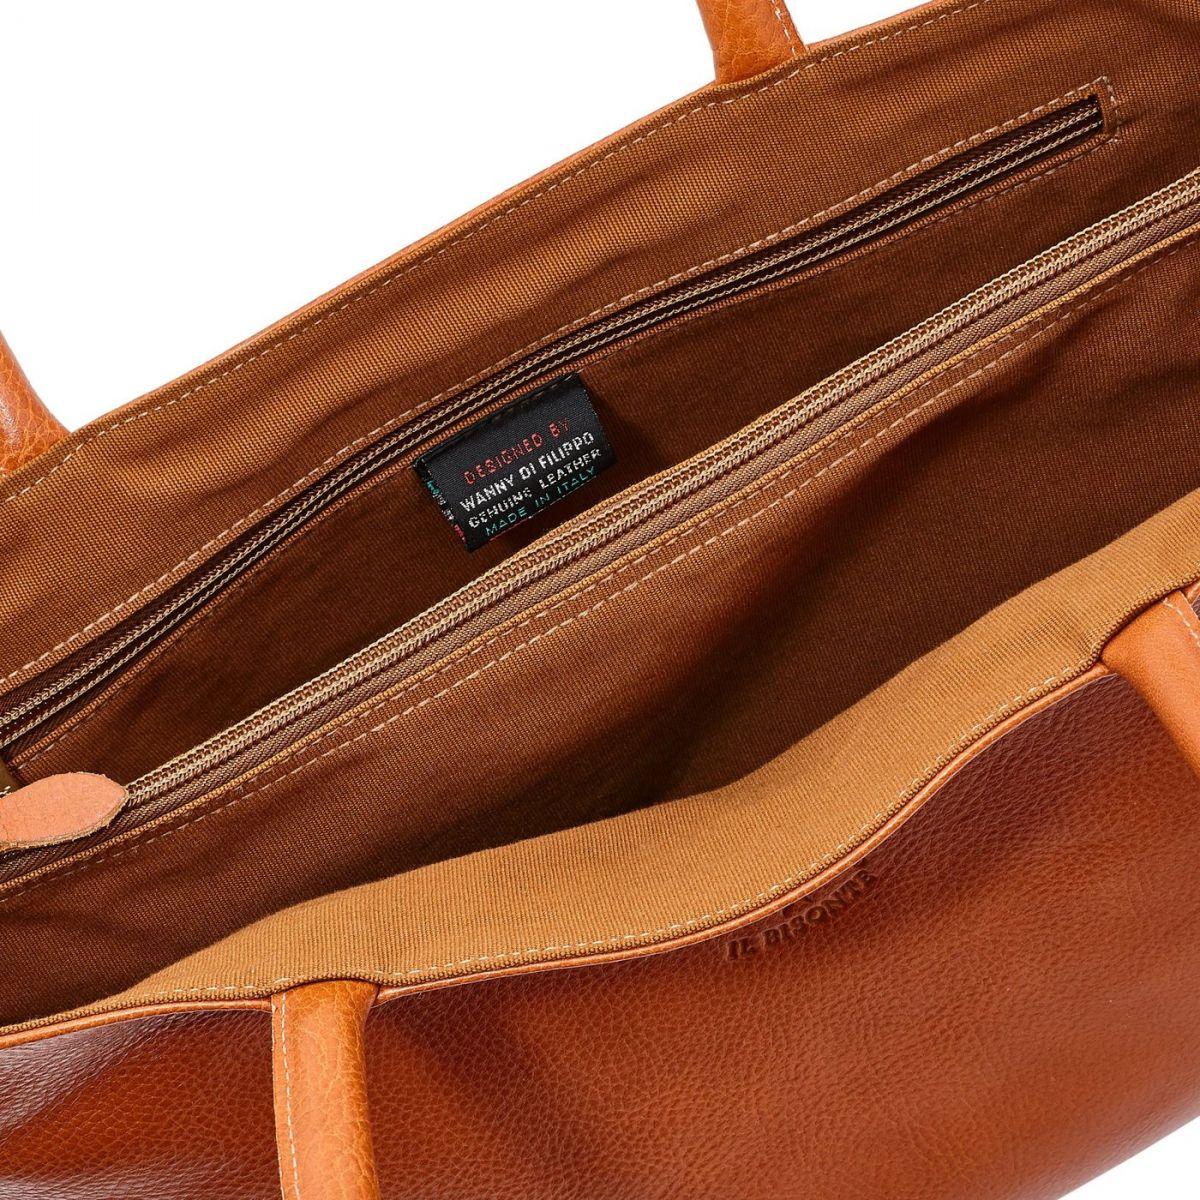 Women's Shoulder Bag in Cowhide Double Leather BSH007 color Caramel | Details